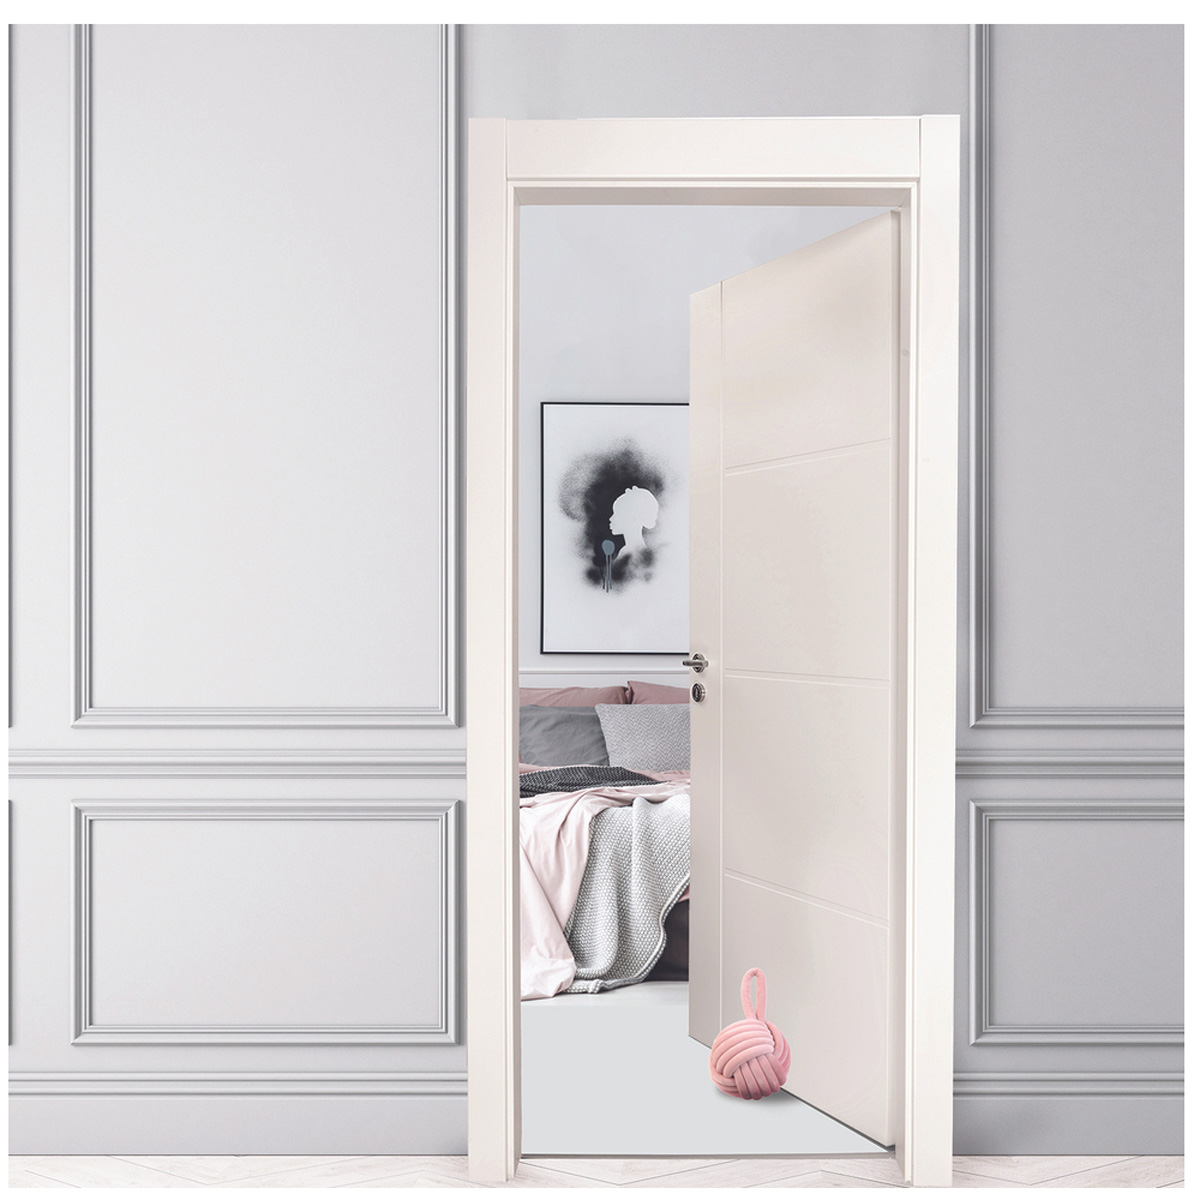 Cale porte velours \'Pelote\' rose - 14x24 cm - [R0286]